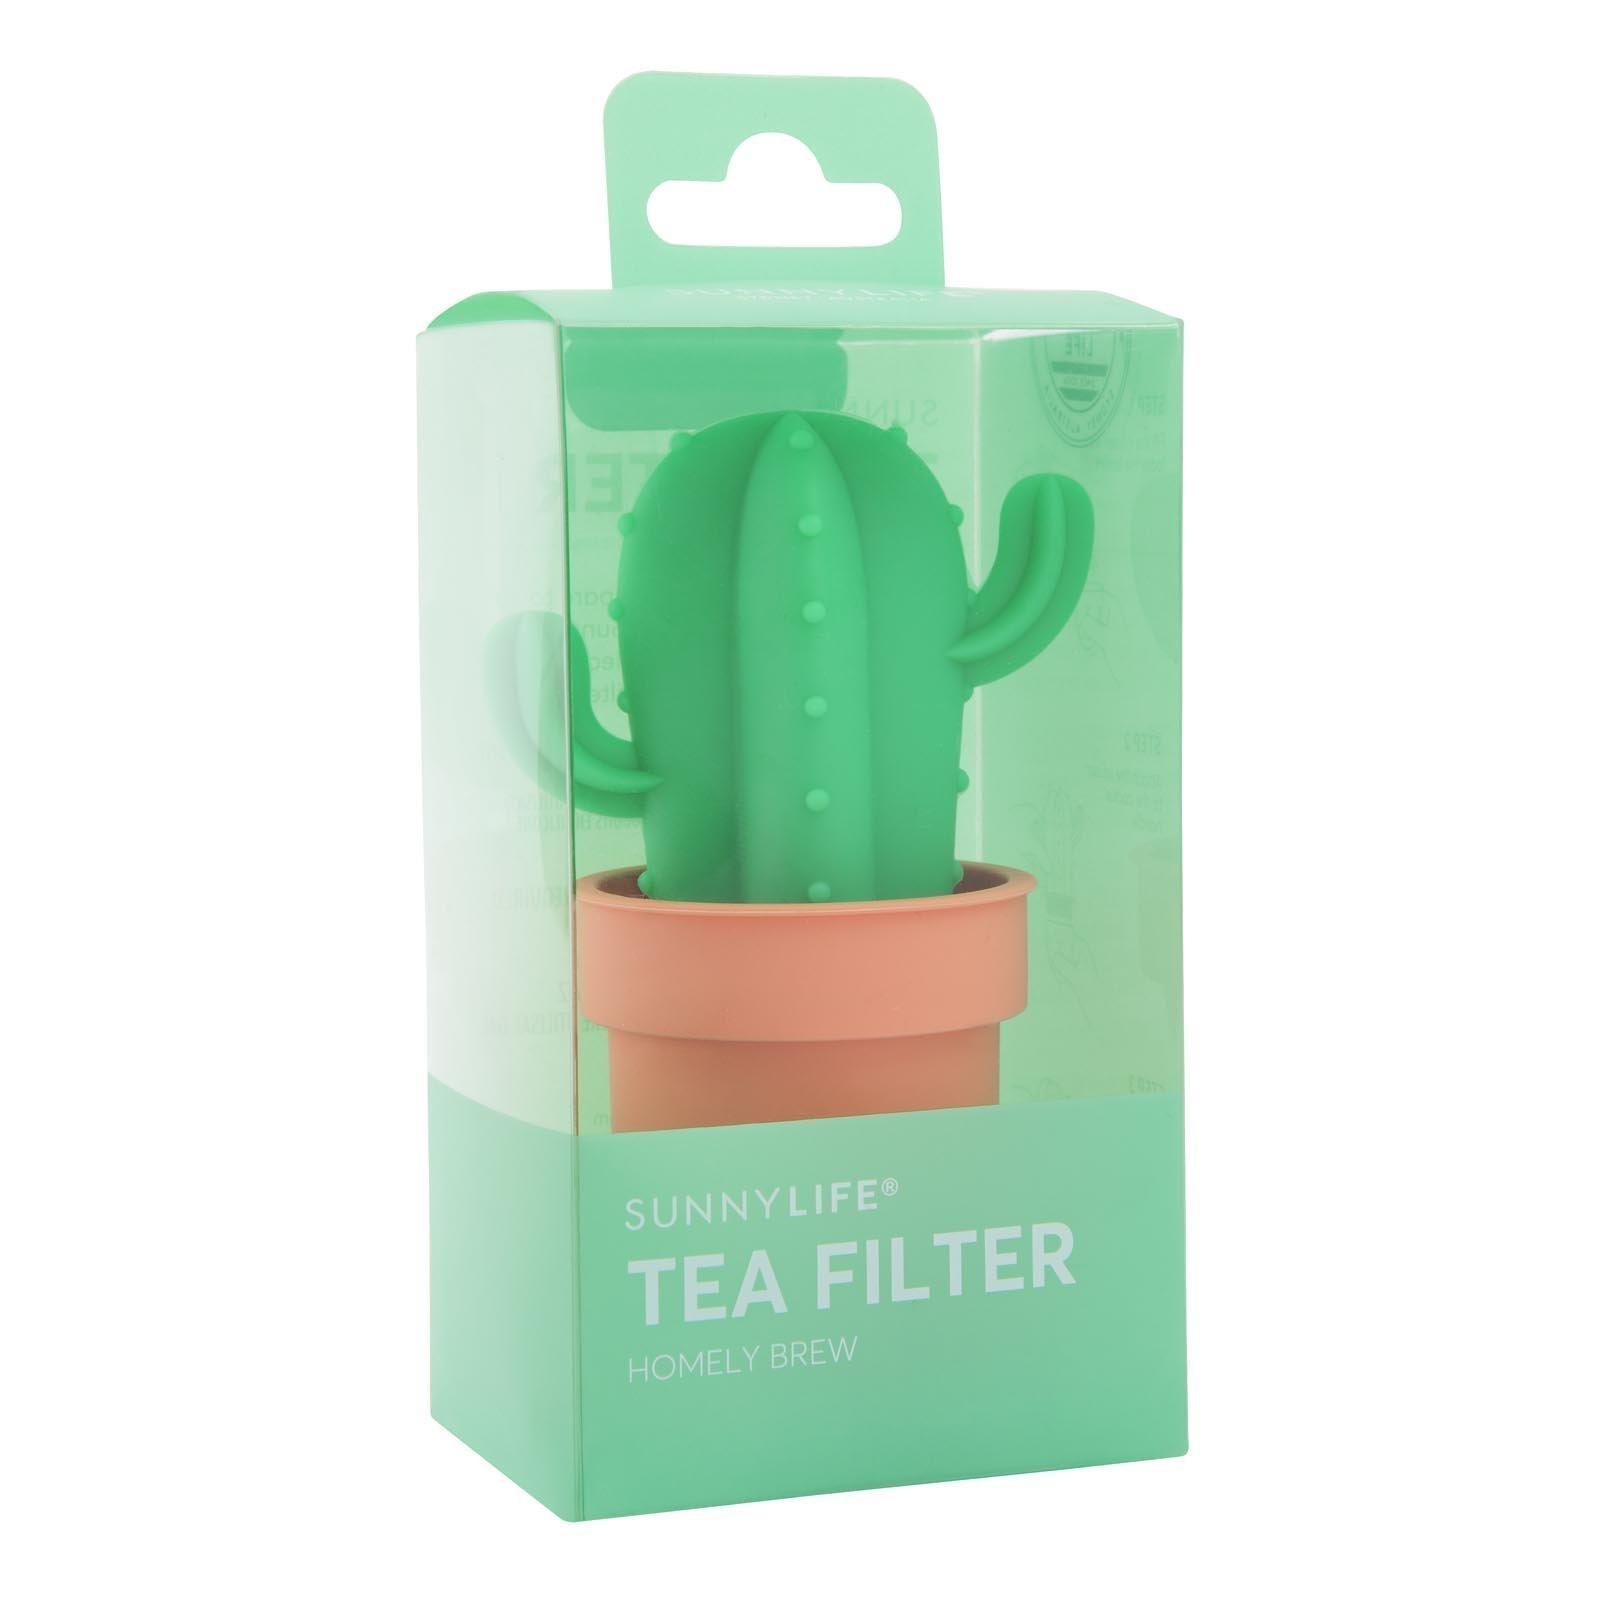 Sunnylife Cactus Tea Filter image